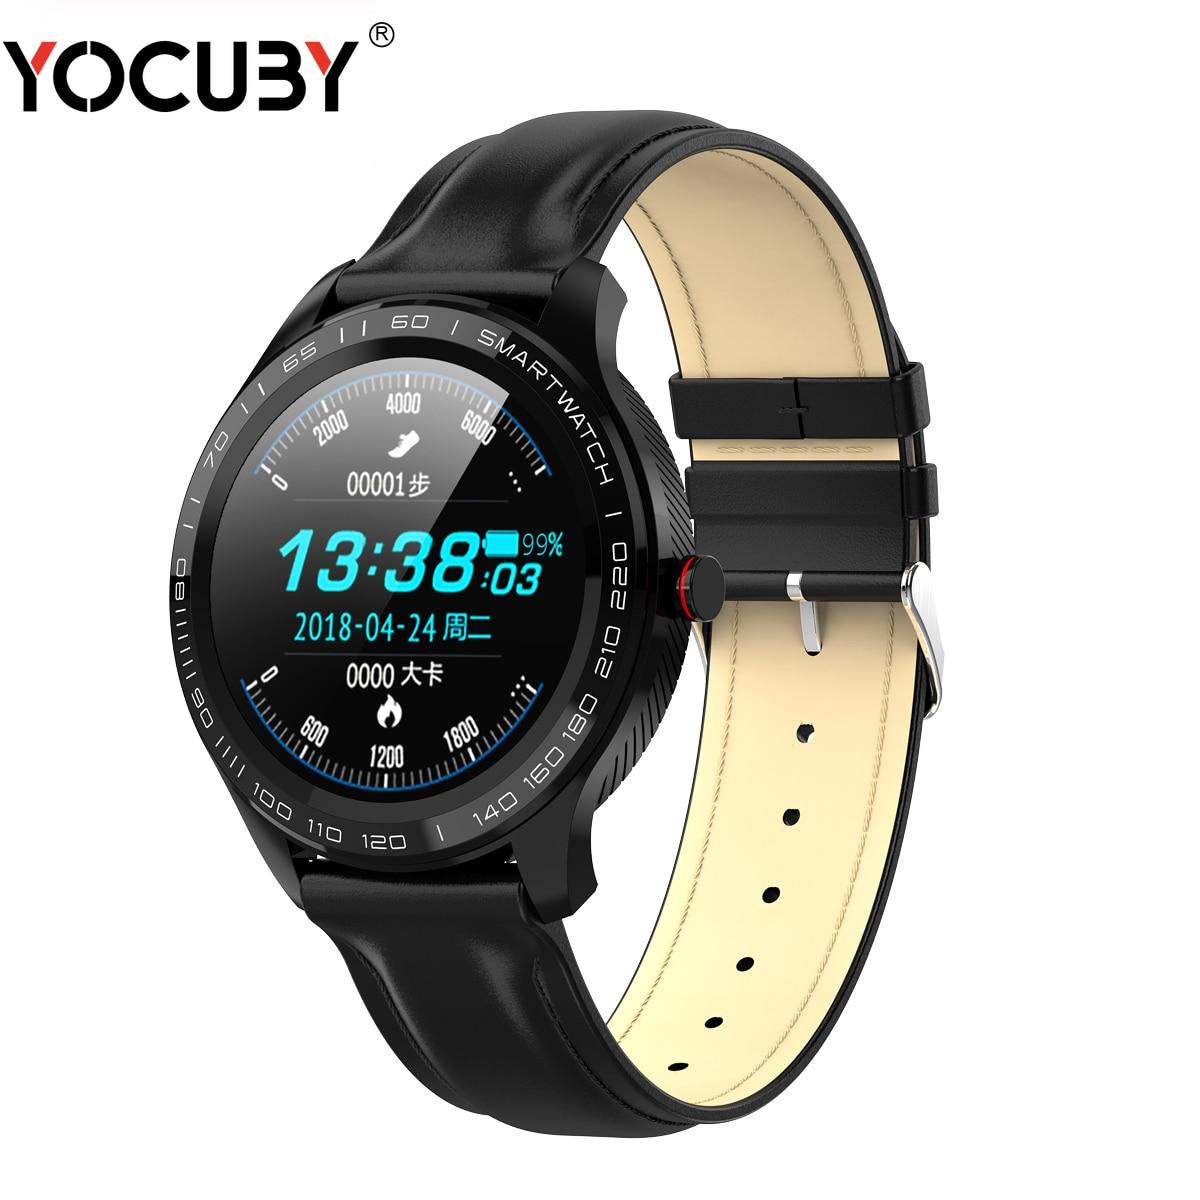 YOCUBY L9 Smart Watch Men ECG PPG HRV Report Heart Rate Sleeping Monitor IP68 Waterproof Step Fitness Tracker Sports Watch PK L7